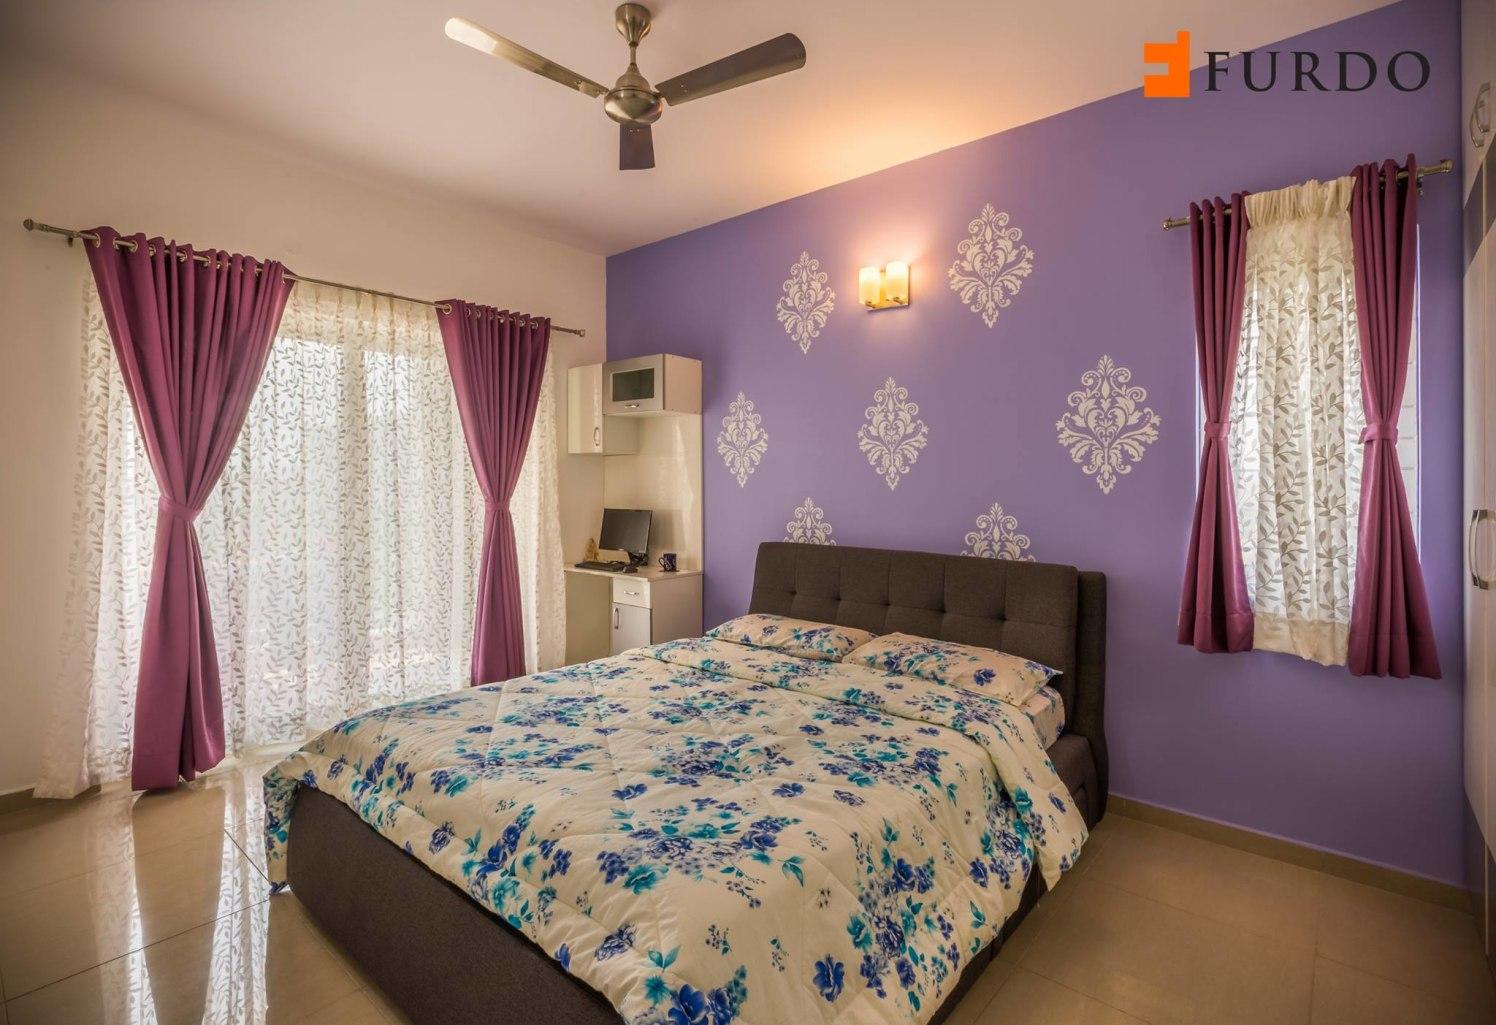 Bedroom With Purple Wall Art by Furdo.com Bedroom Modern | Interior Design Photos & Ideas